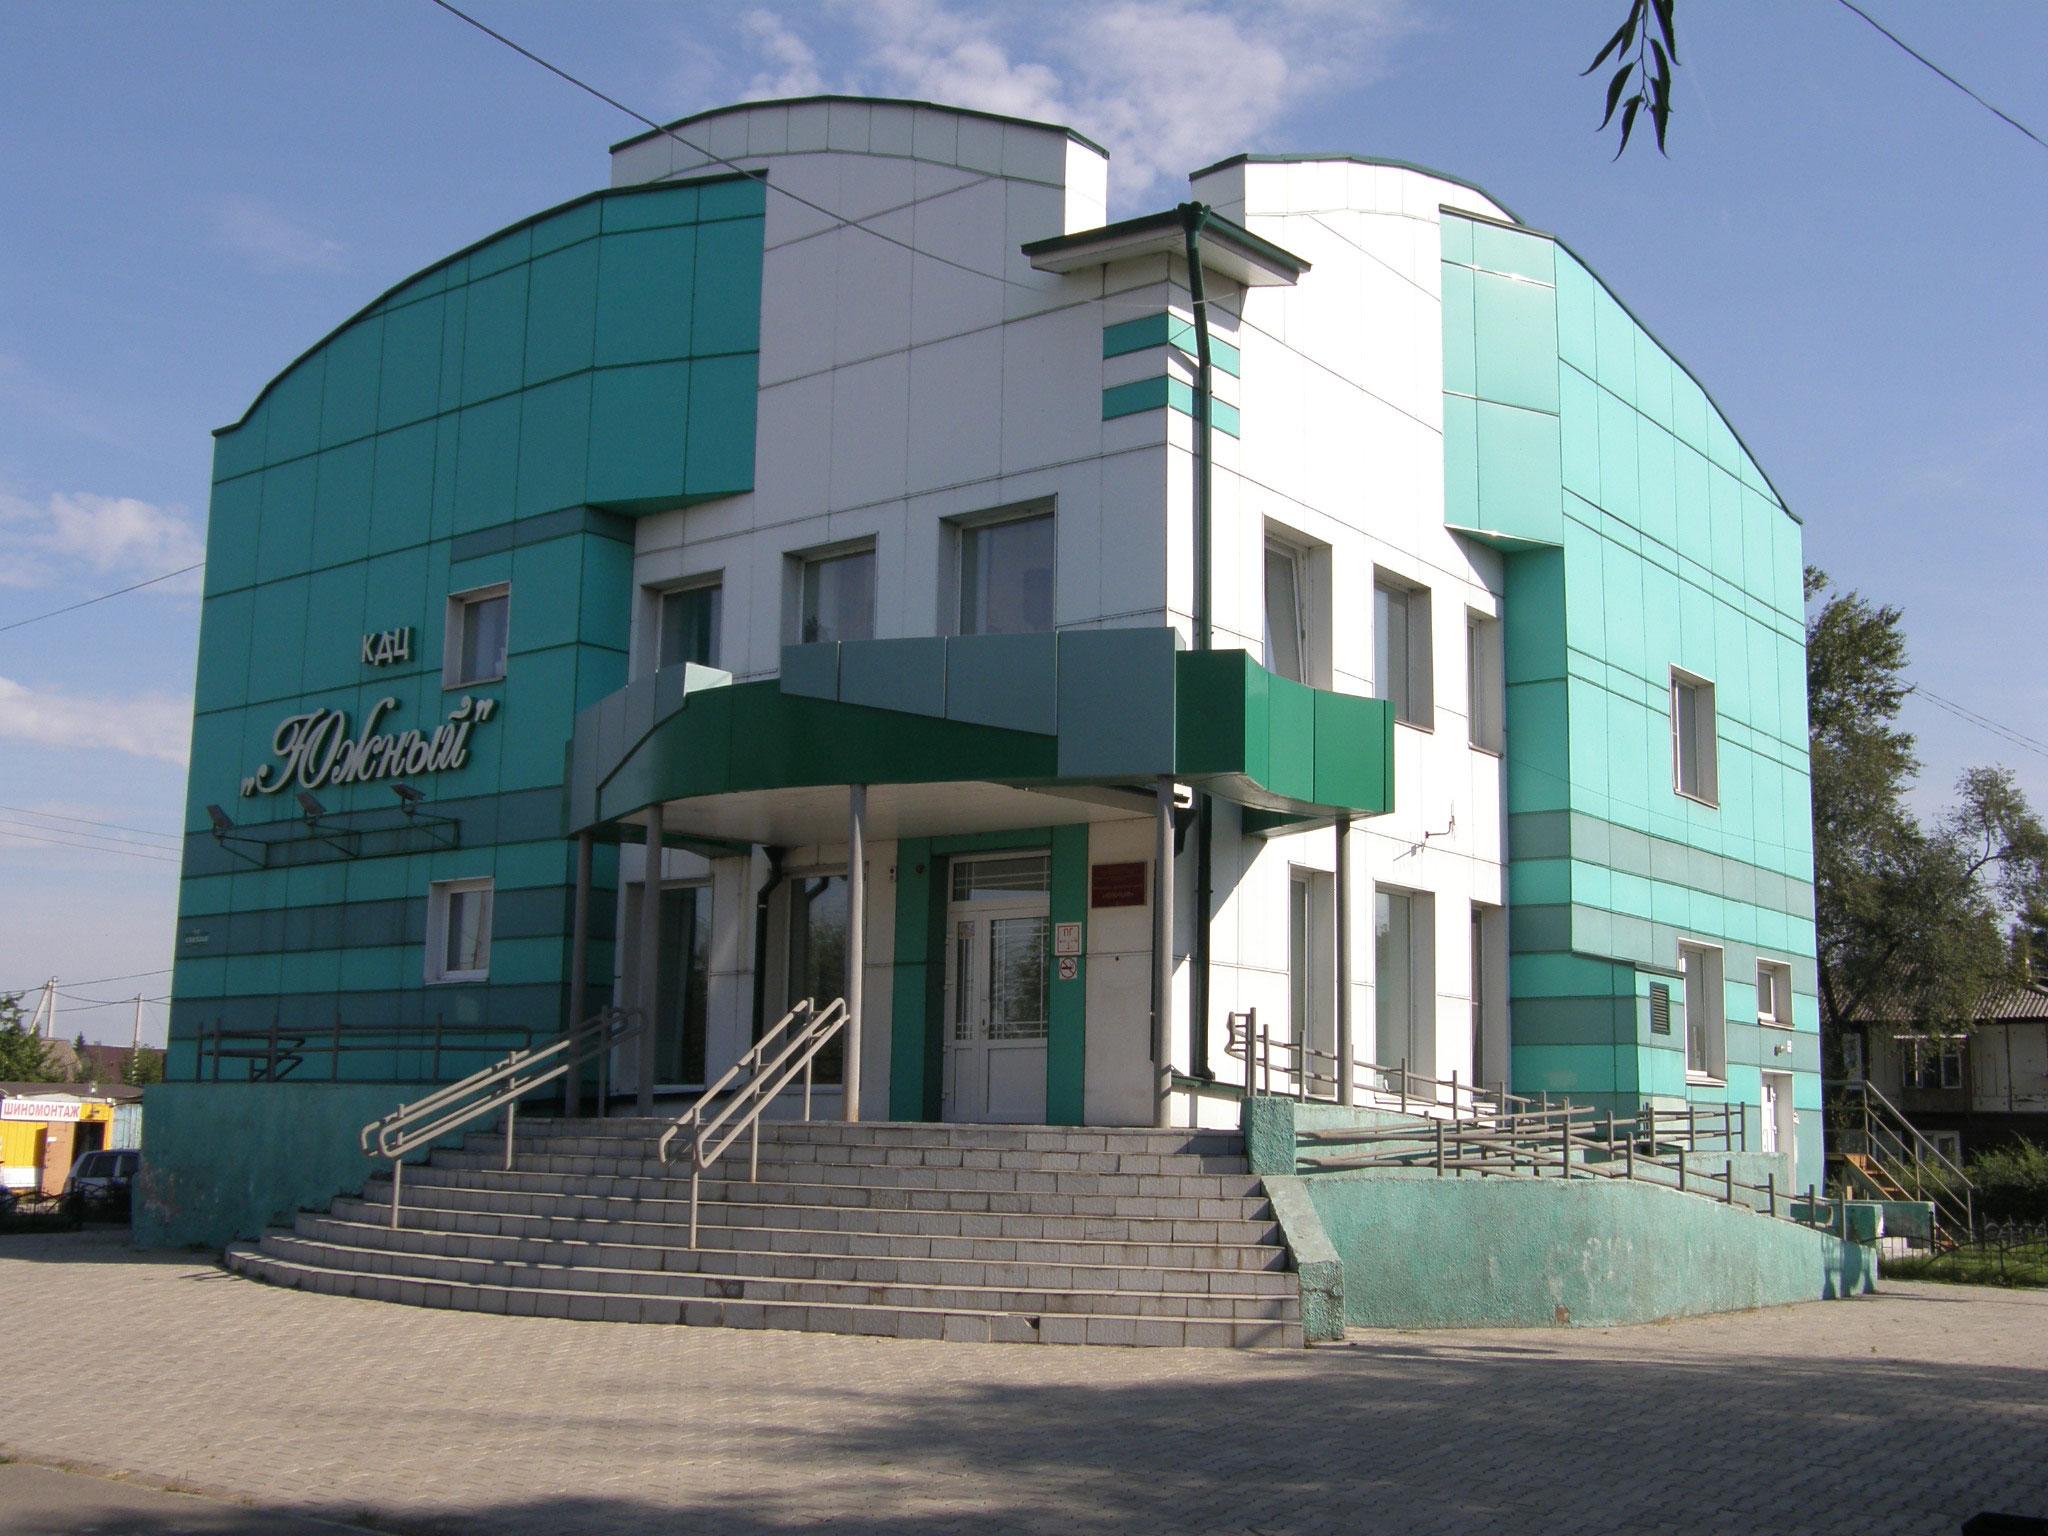 Культурно-досуговый центр по ул. Аскизской в г. Абакане. Арх. Бредюк А.В.